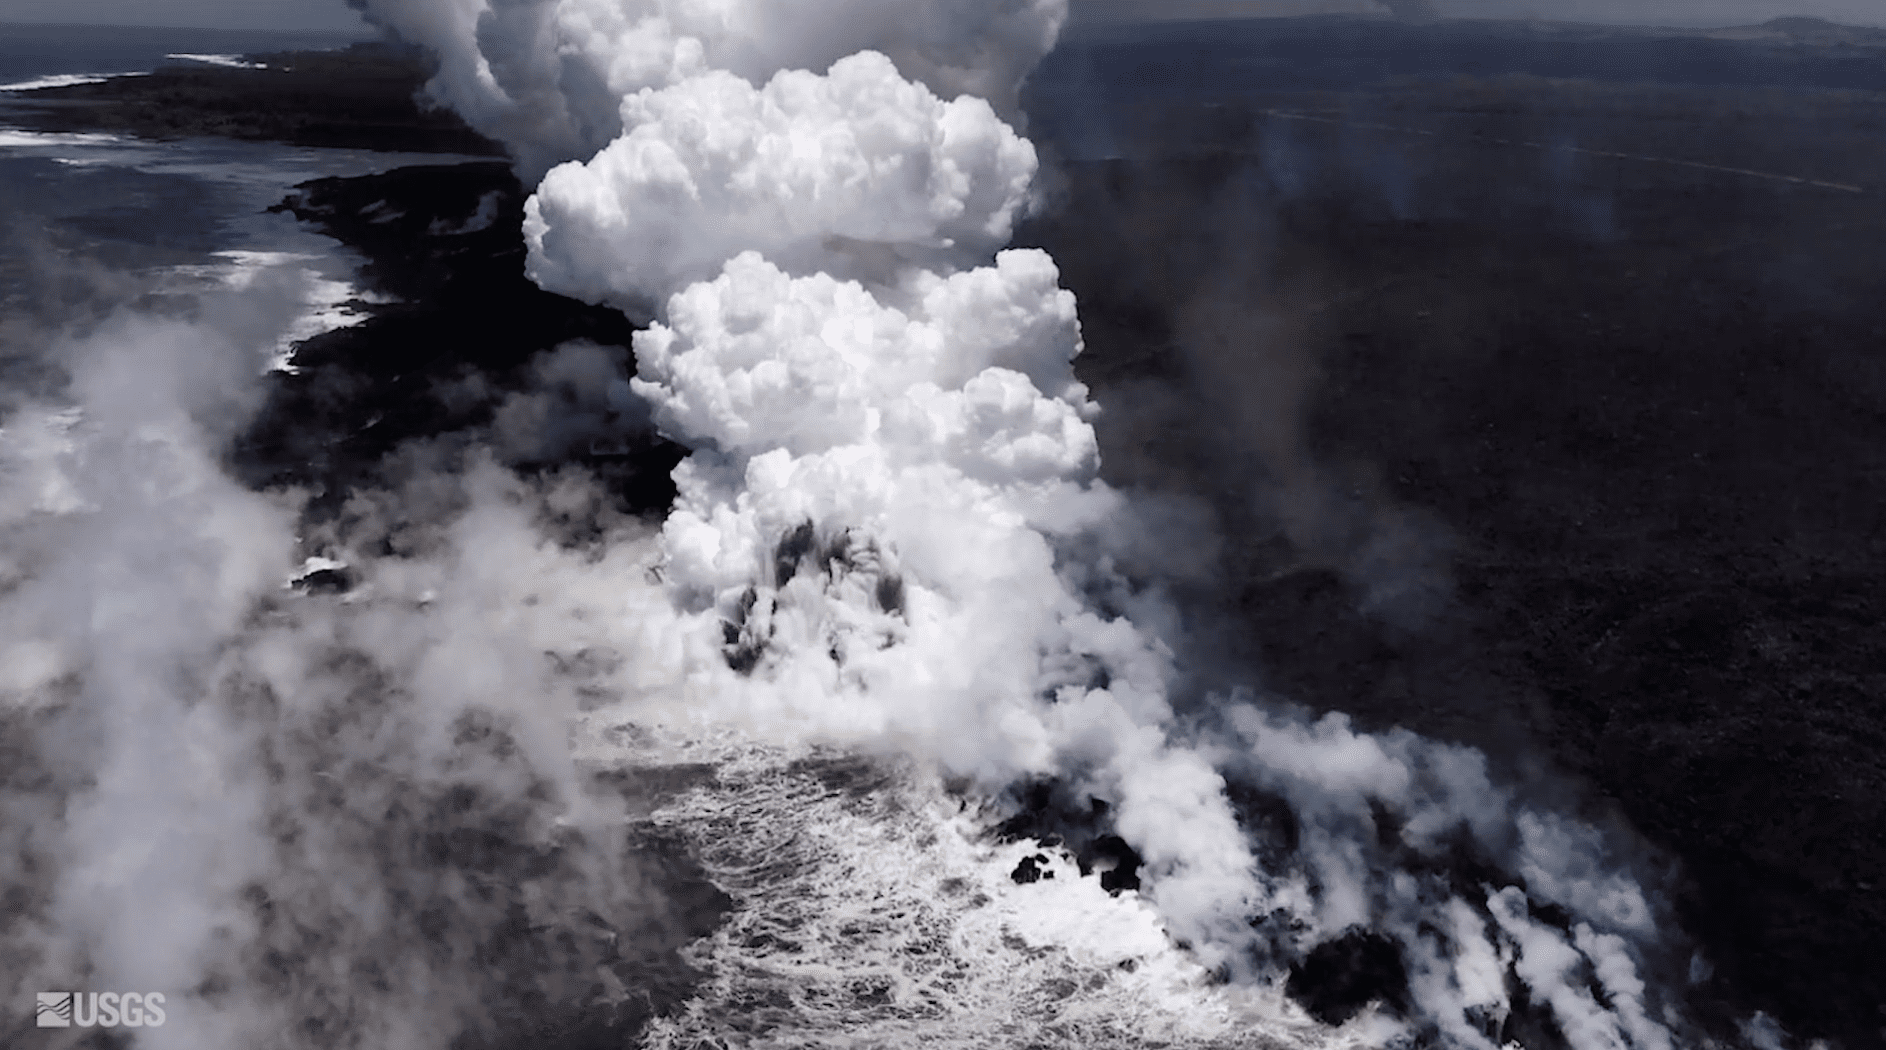 Exploding Lava Creates New Danger as Kilauea Flows Into the Sea